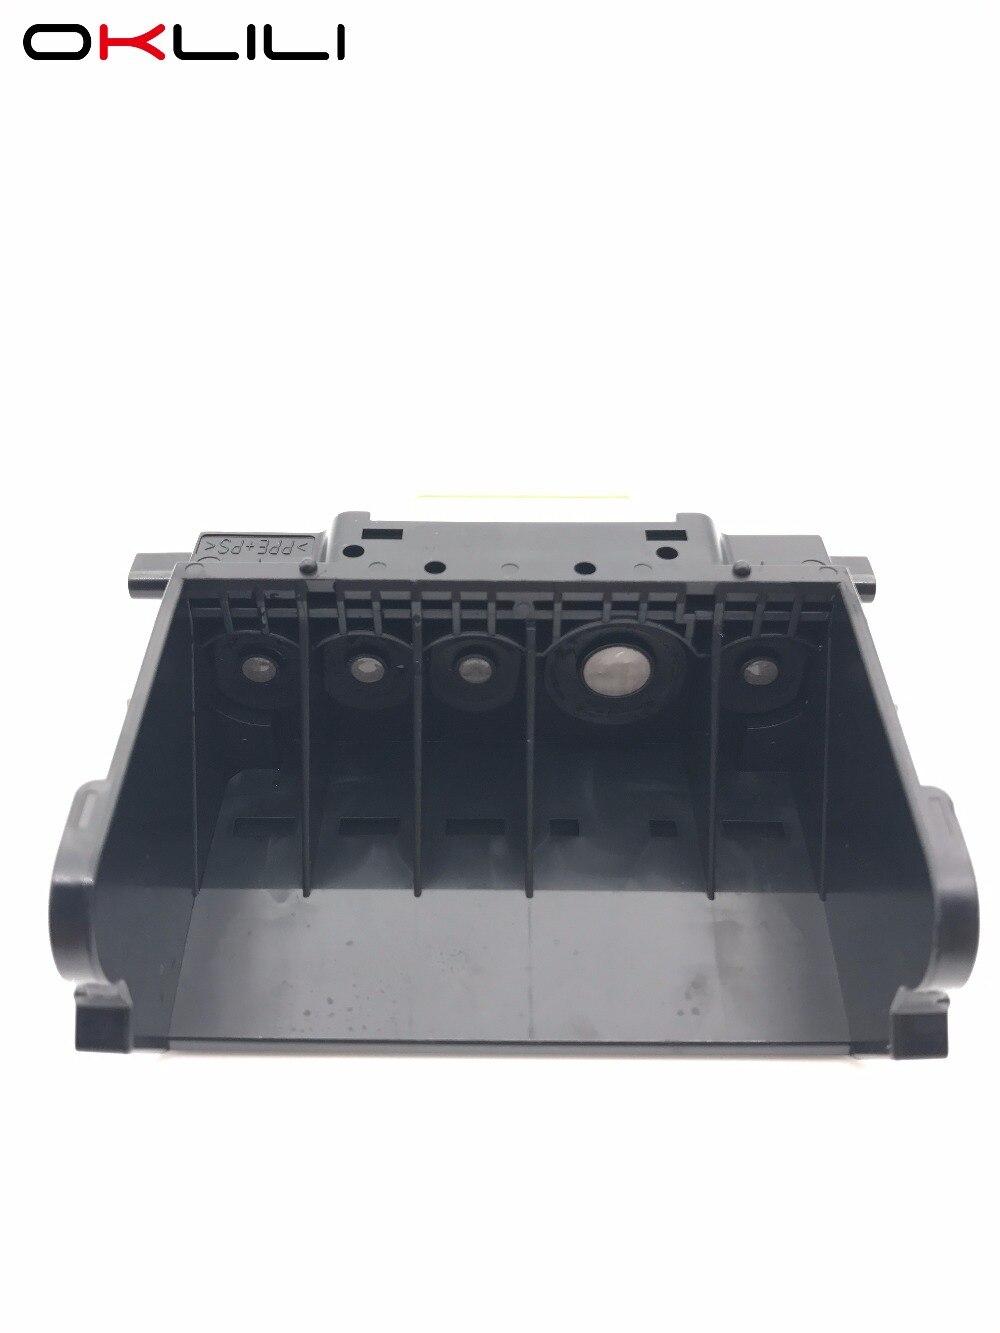 OKLILI QY6-0061 QY6-0061-000 Impressora de Cabeça de Impressão Da Cabeça De Impressão para Canon iP4300 iP5200 iP5200R MP600 MP600R MP800 MP800R MP830